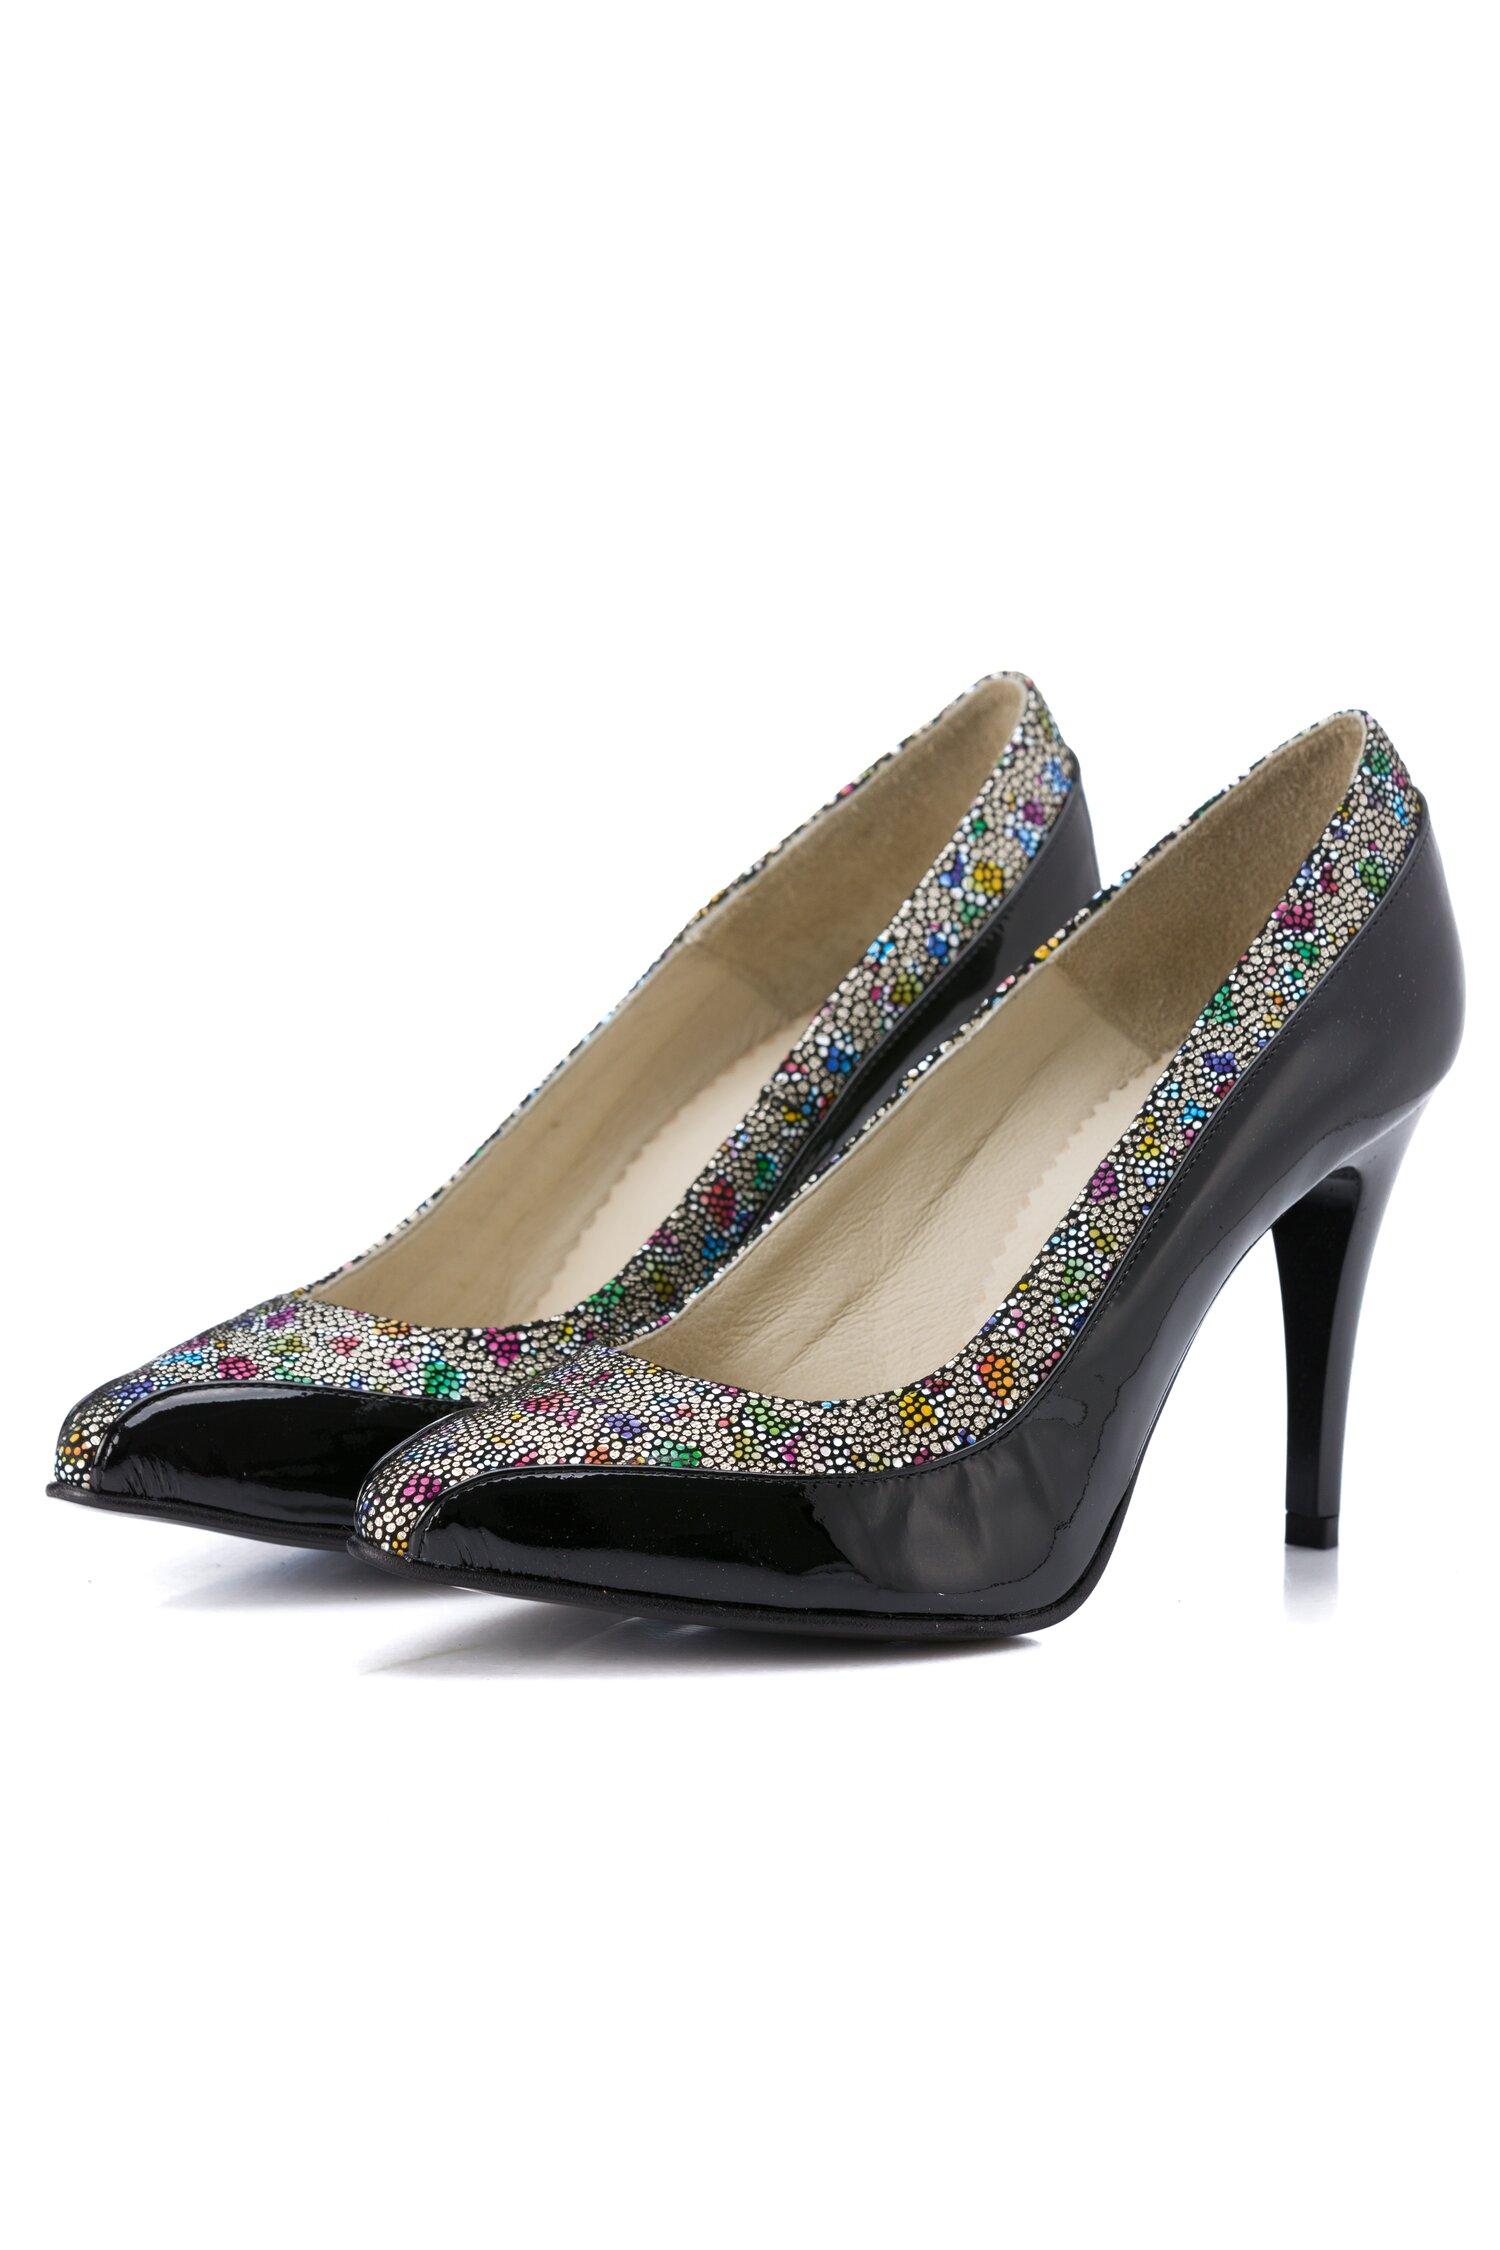 Pantofi negri cu imprimeu mozaic colorat